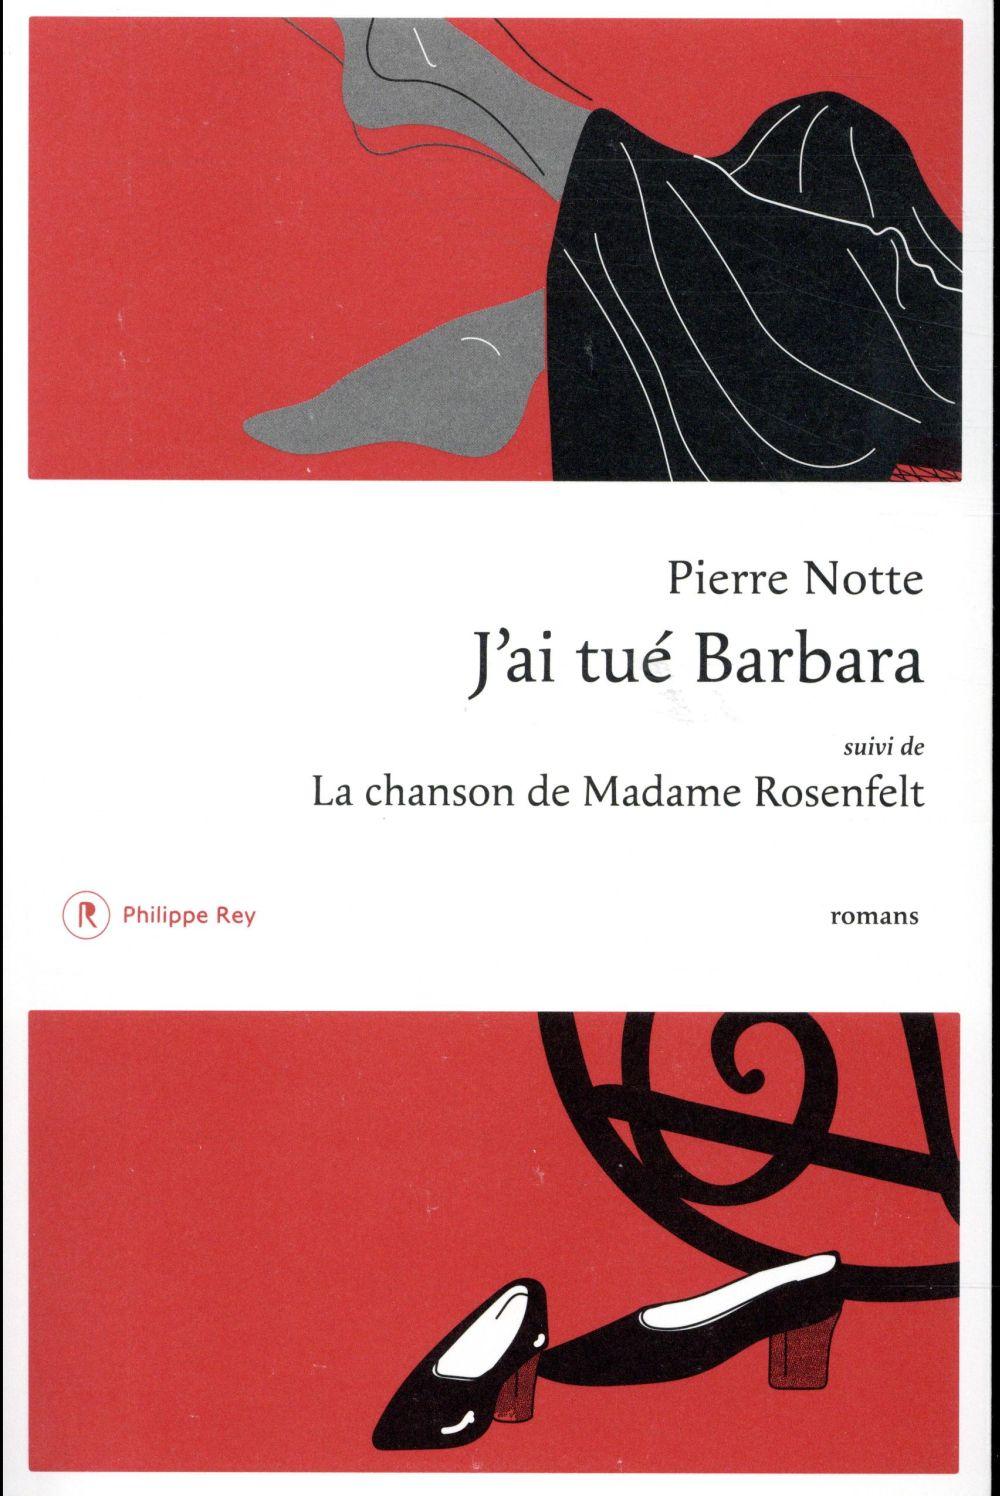 J'AI TUE BARBARA SUIVI DE LA CHANSON DE MADAME ROSENFELT